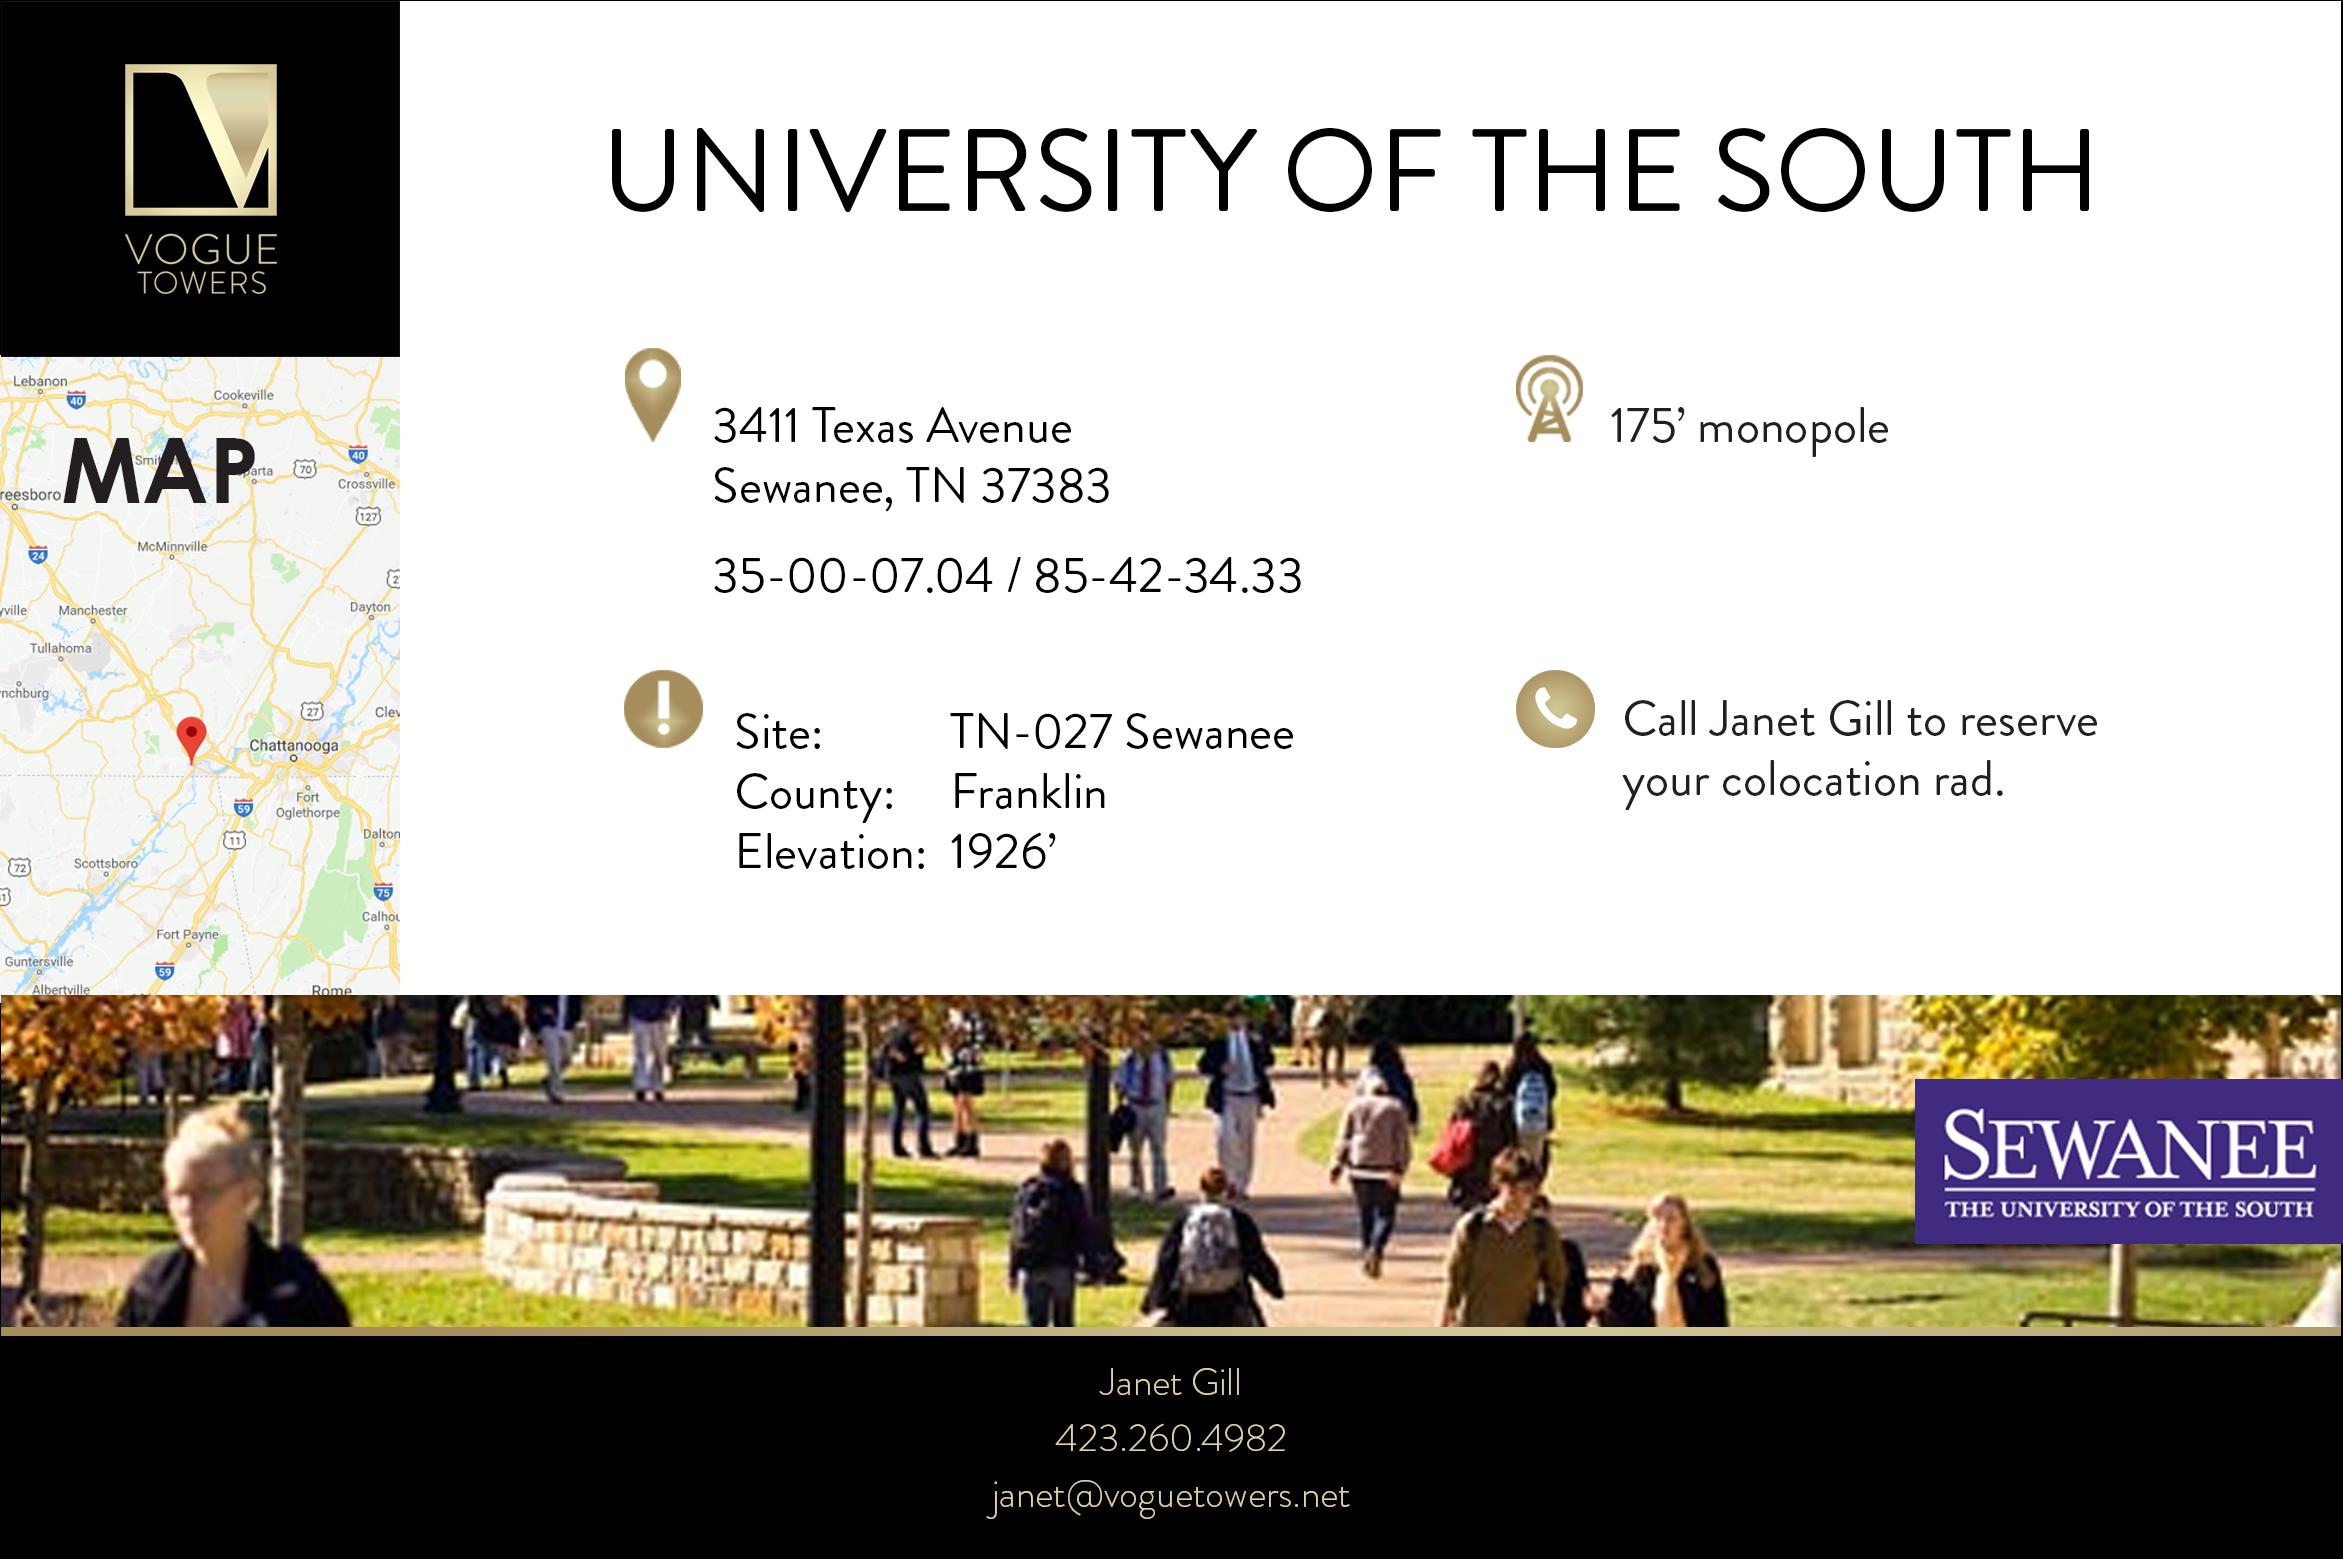 University of the South - Sewanee, TN